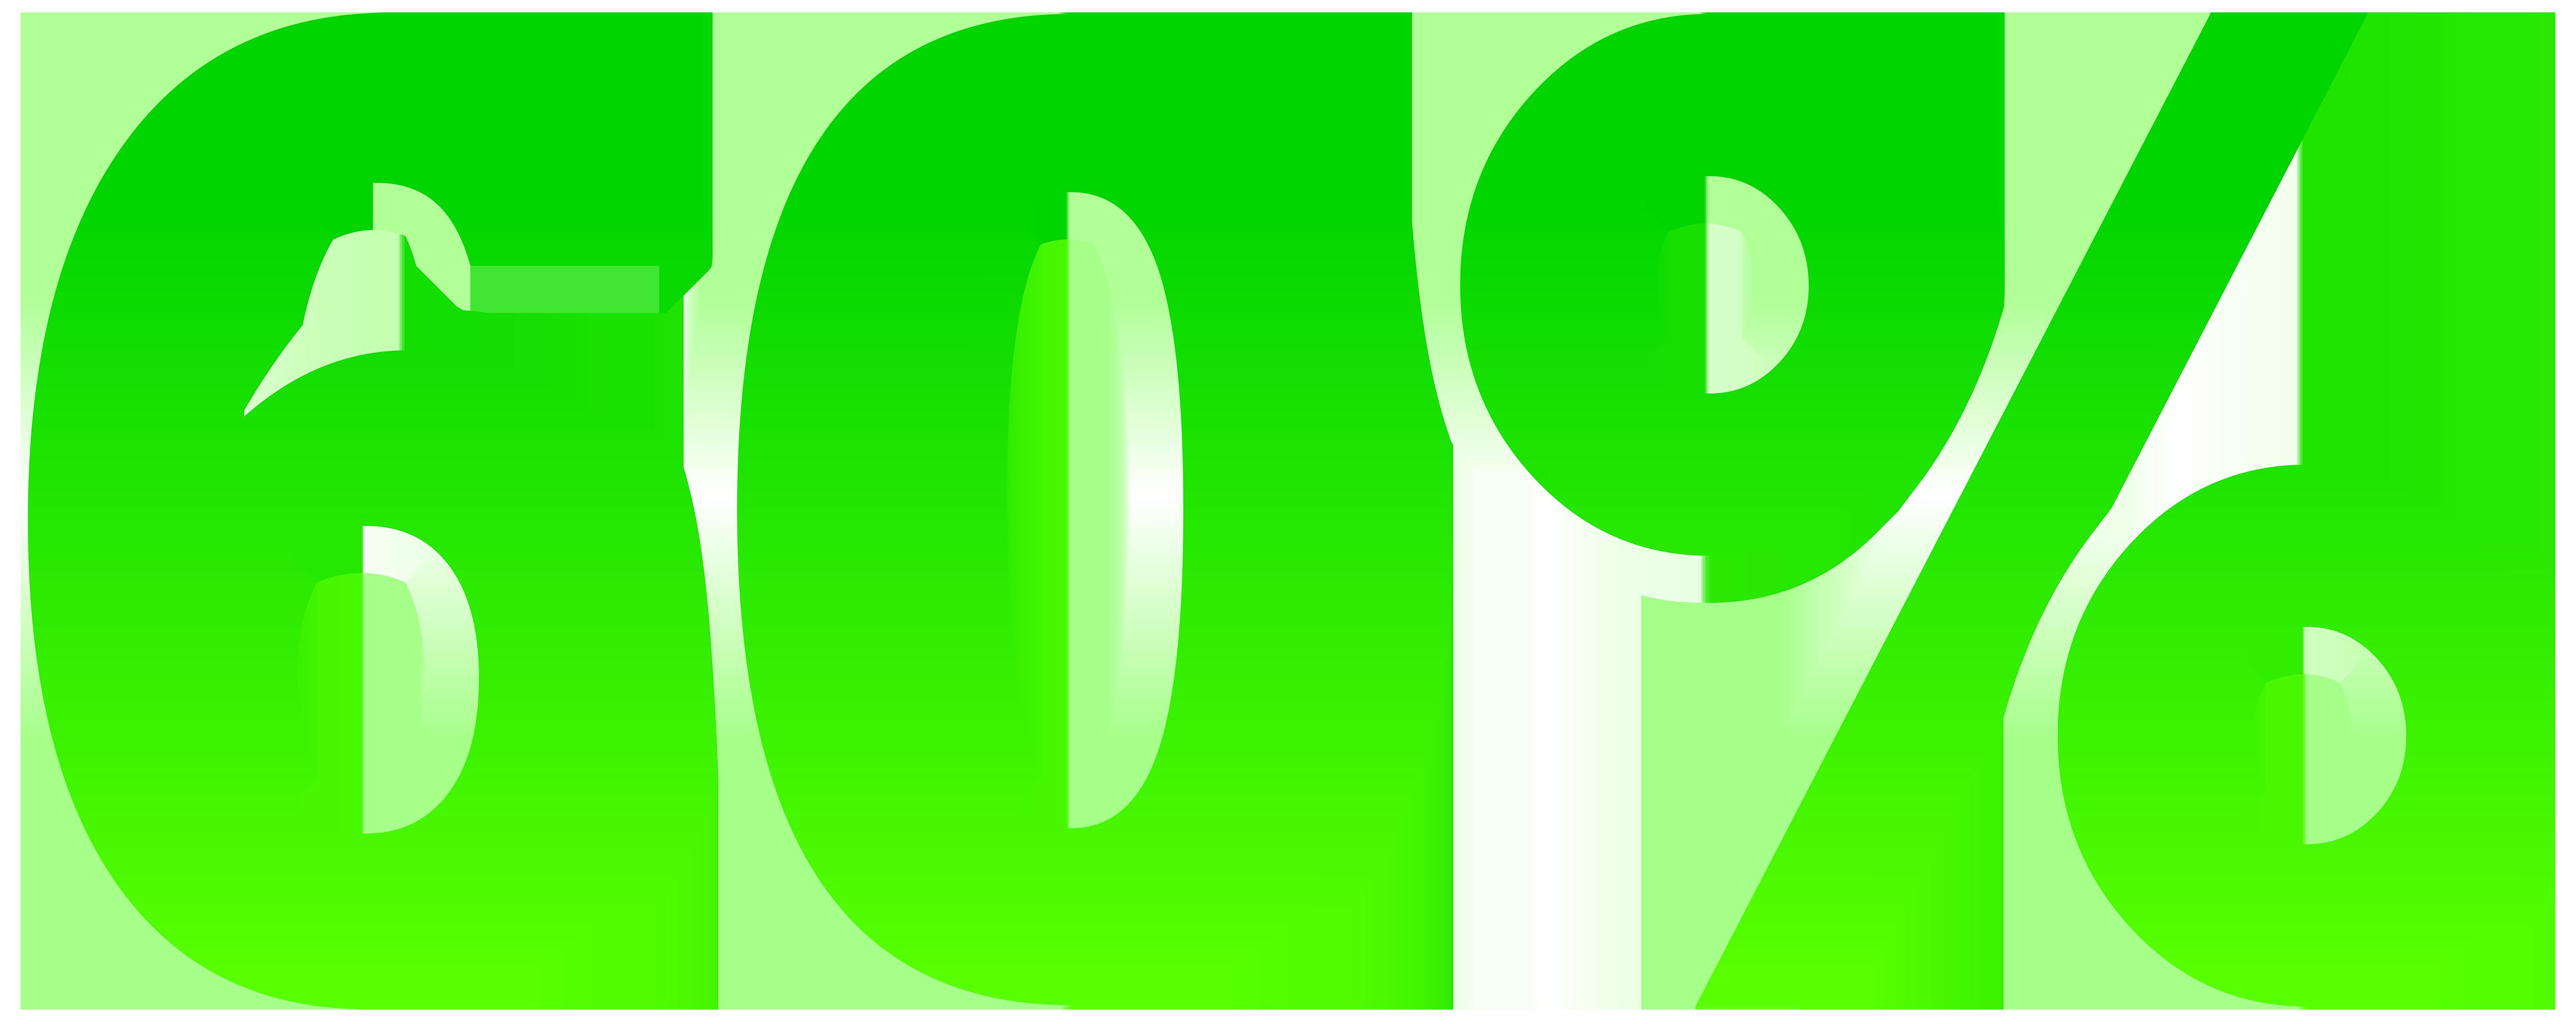 60 clipart banner transparent download 60 Off Sale Transparent PNG Clip Art Image banner transparent download